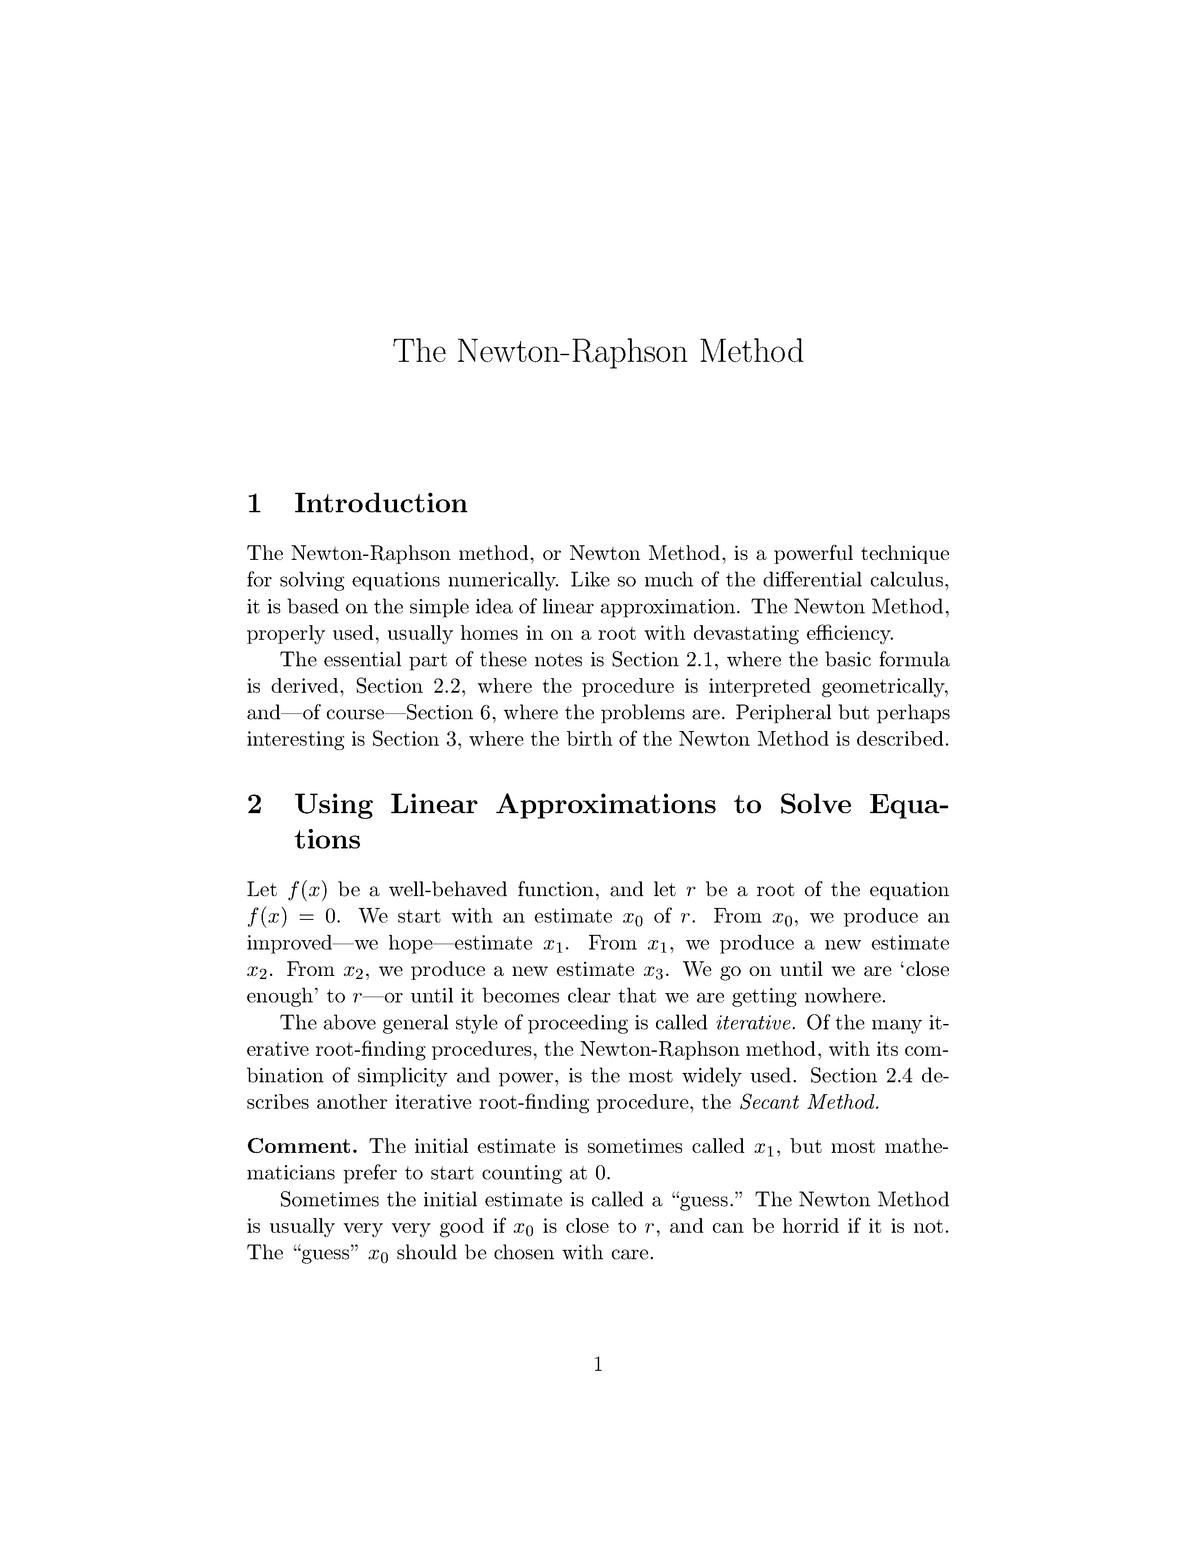 Newton-raphson method - MAST30012 Discrete Mathematics - StuDocu